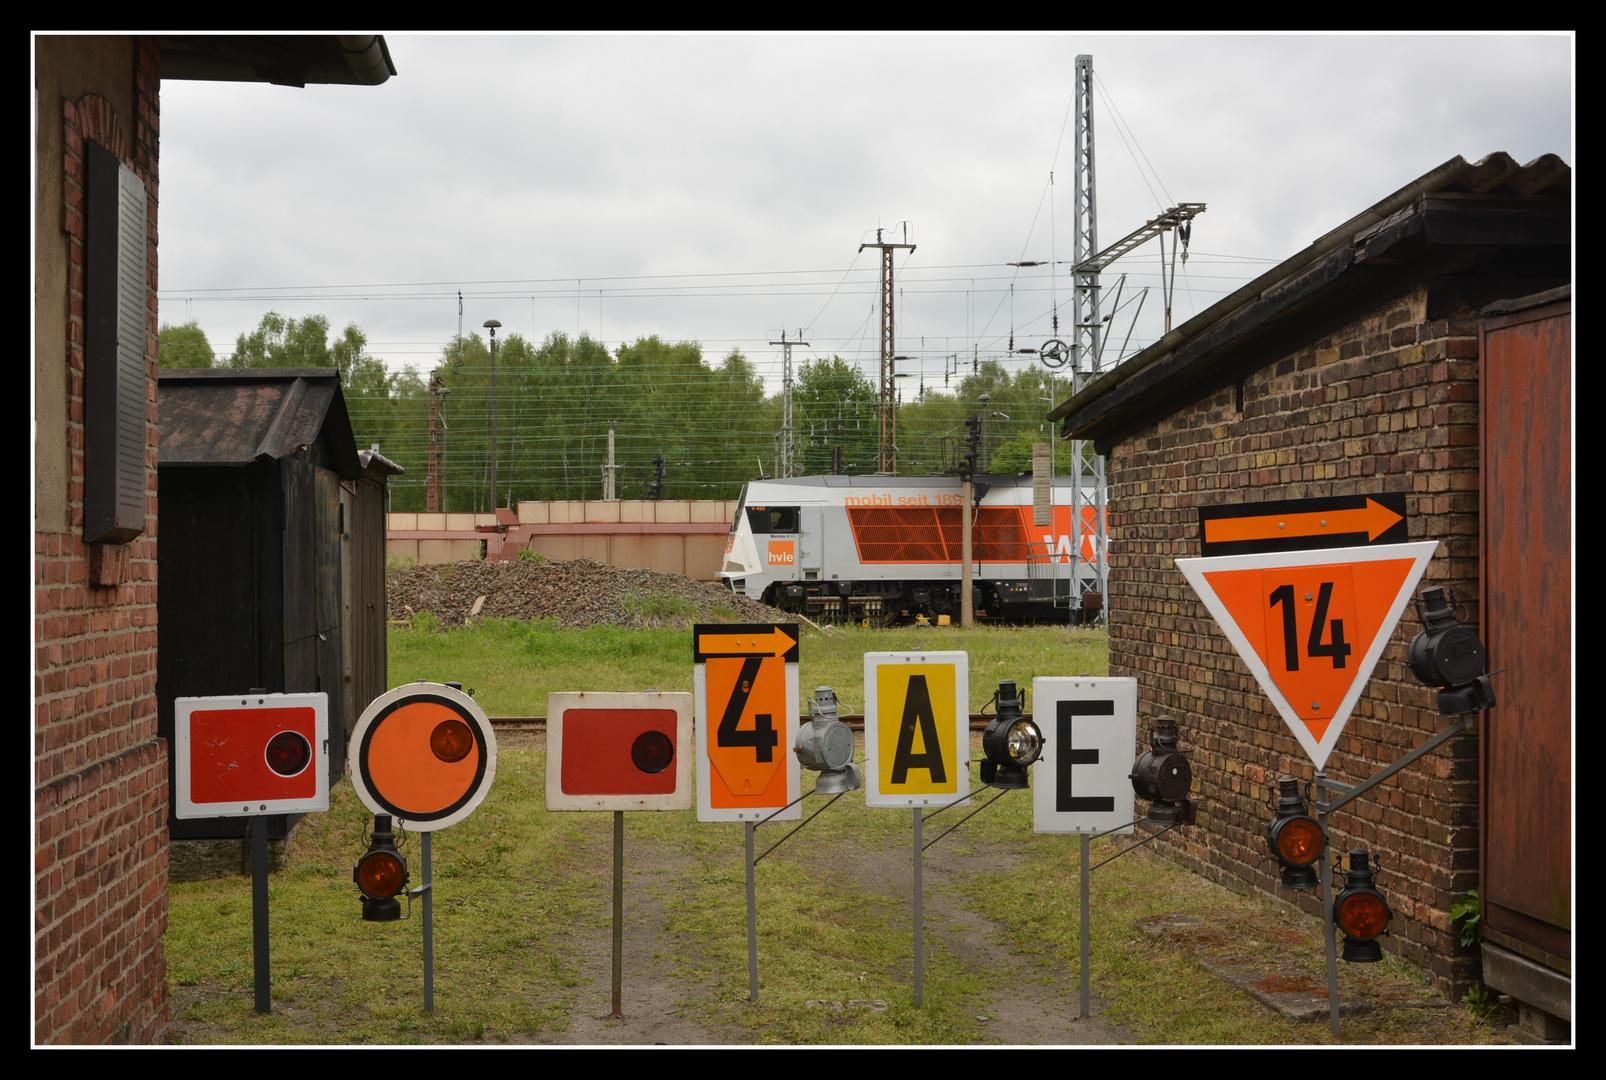 Signalparade